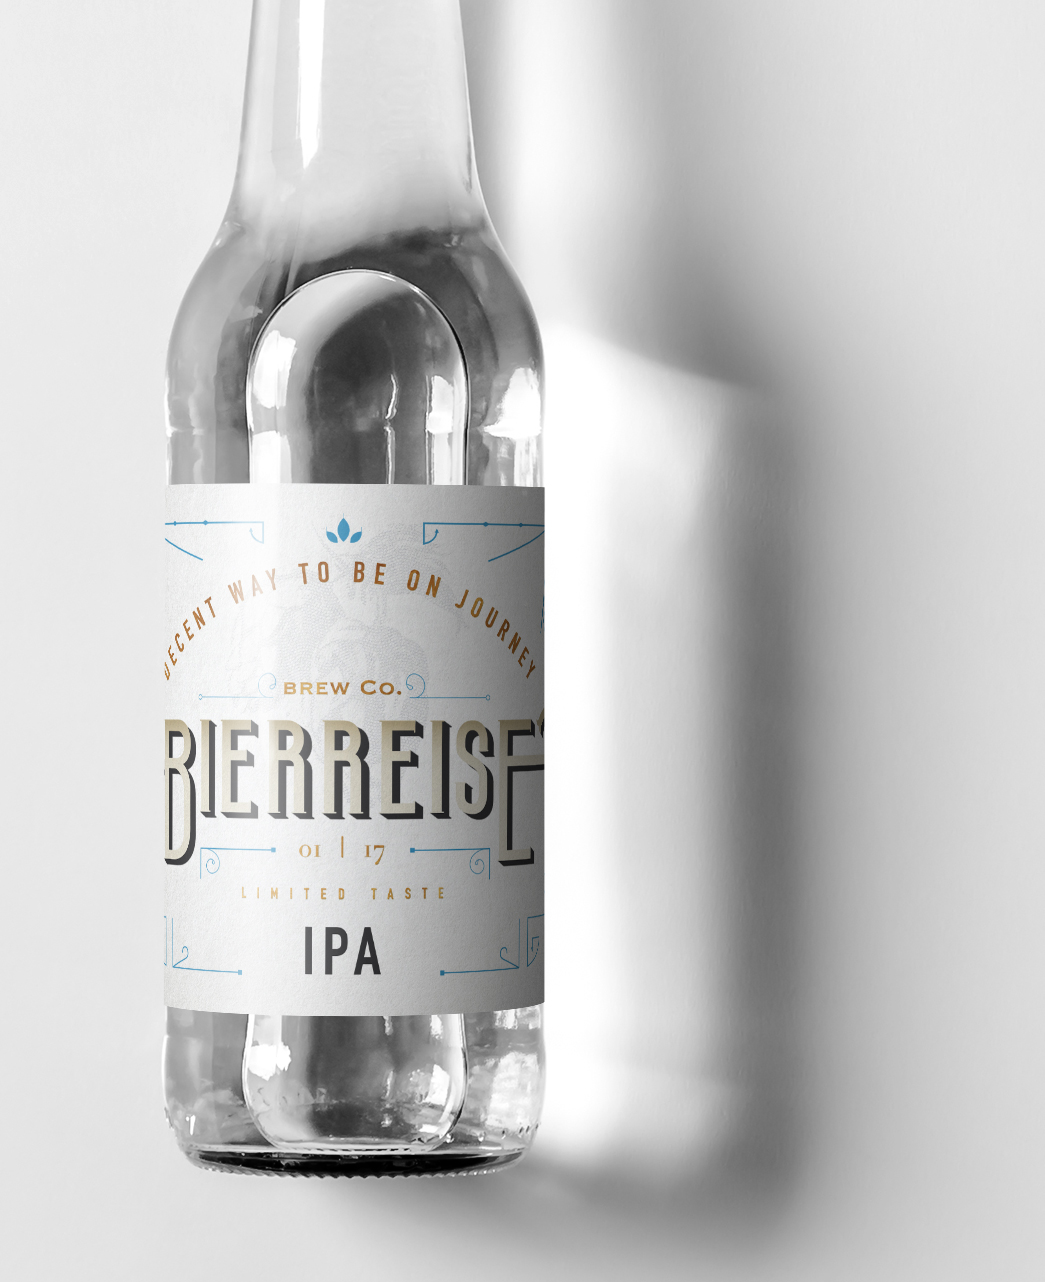 05_Beer Mock-up 5_one bottle_top view.jpg